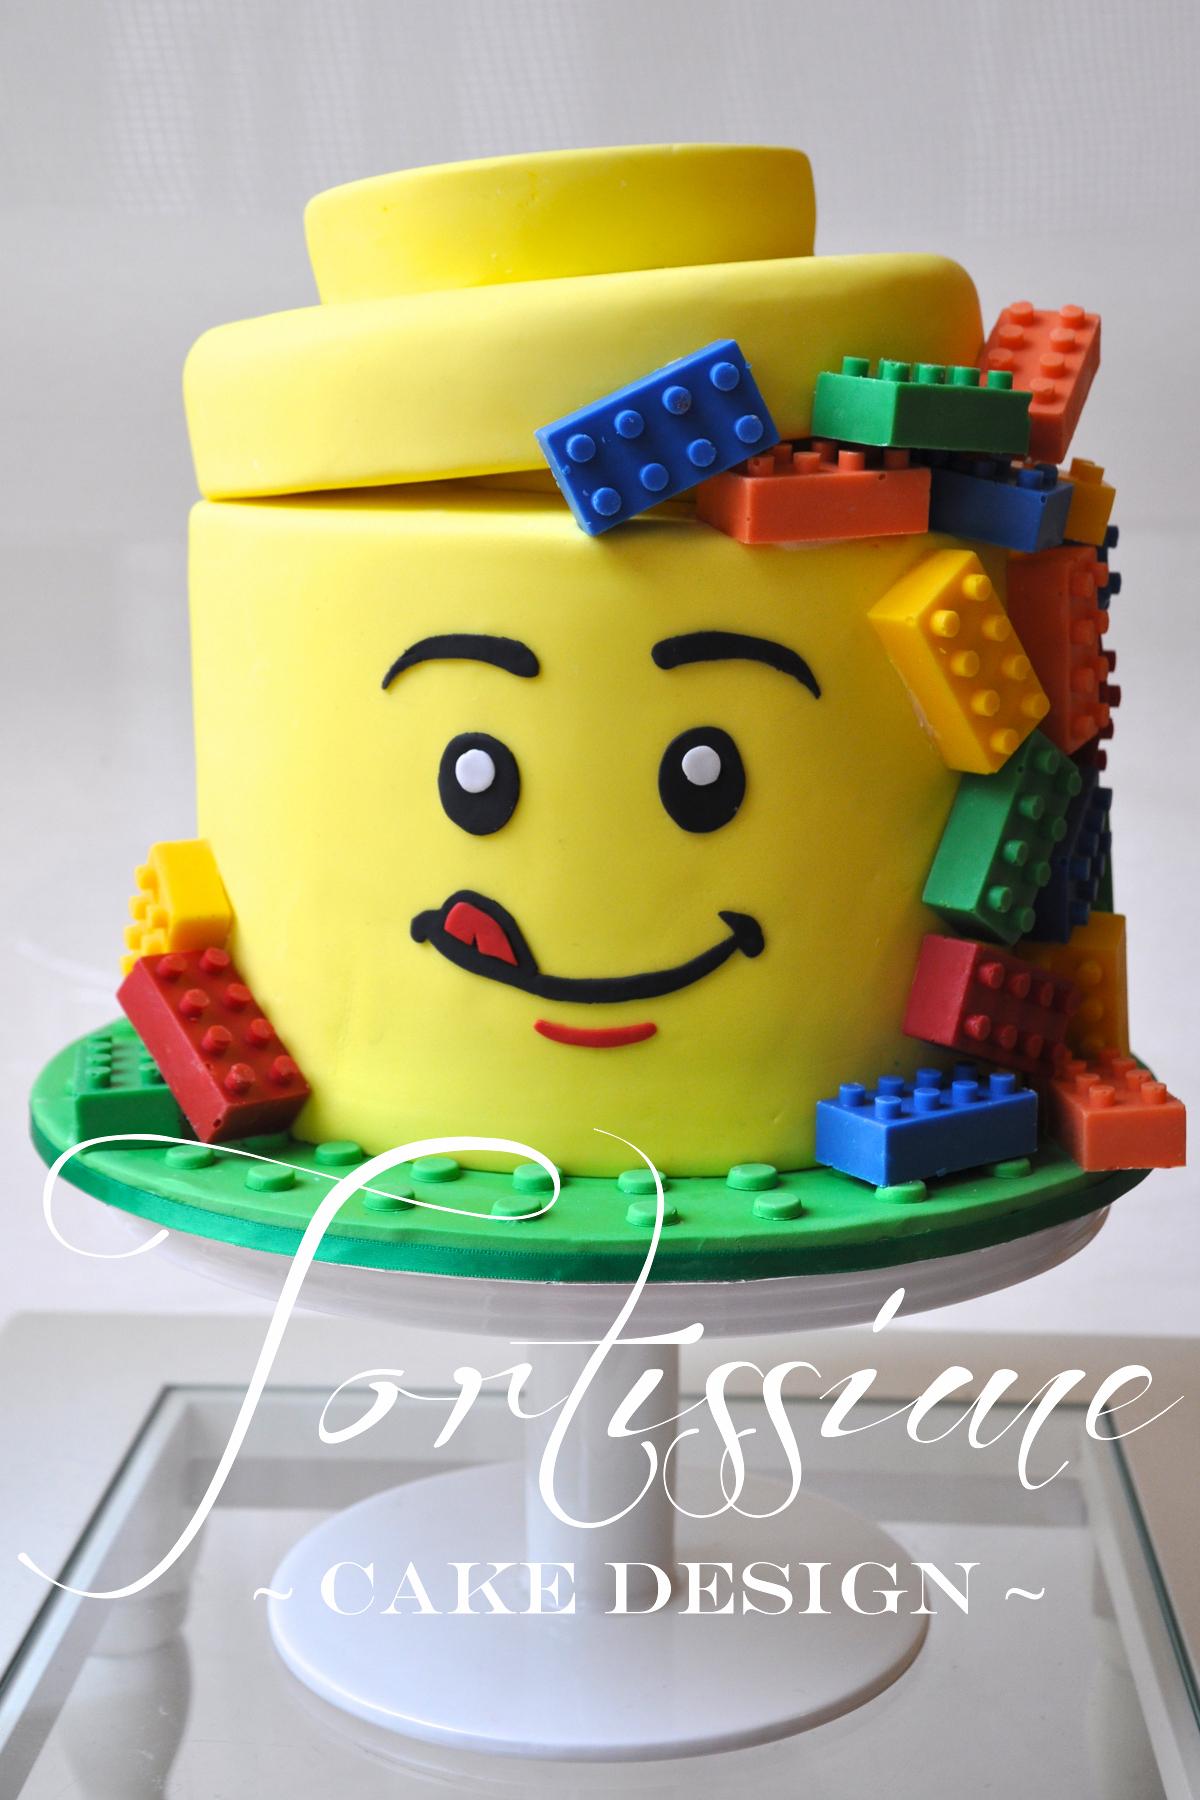 Lego Man Head Cake With Solid Chocolate Lego Blocks Bolos De Aniversario Menina Bolo De Lego Lego De Chocolate